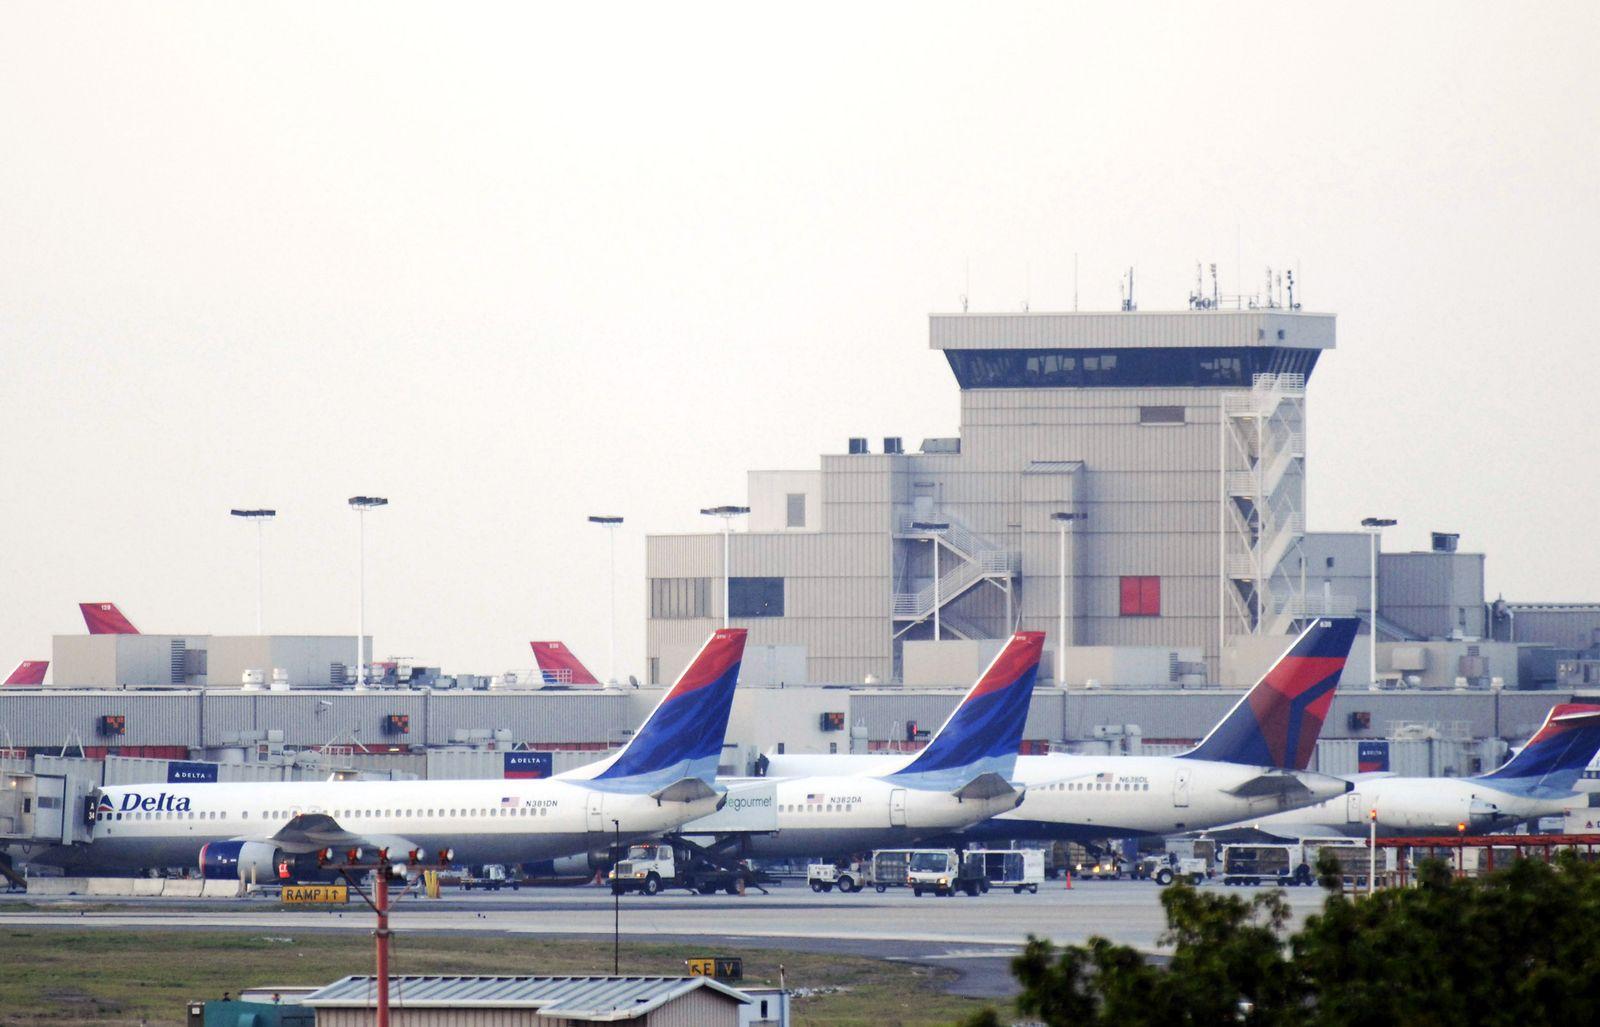 Südstaaten / Atlanta Flughafen